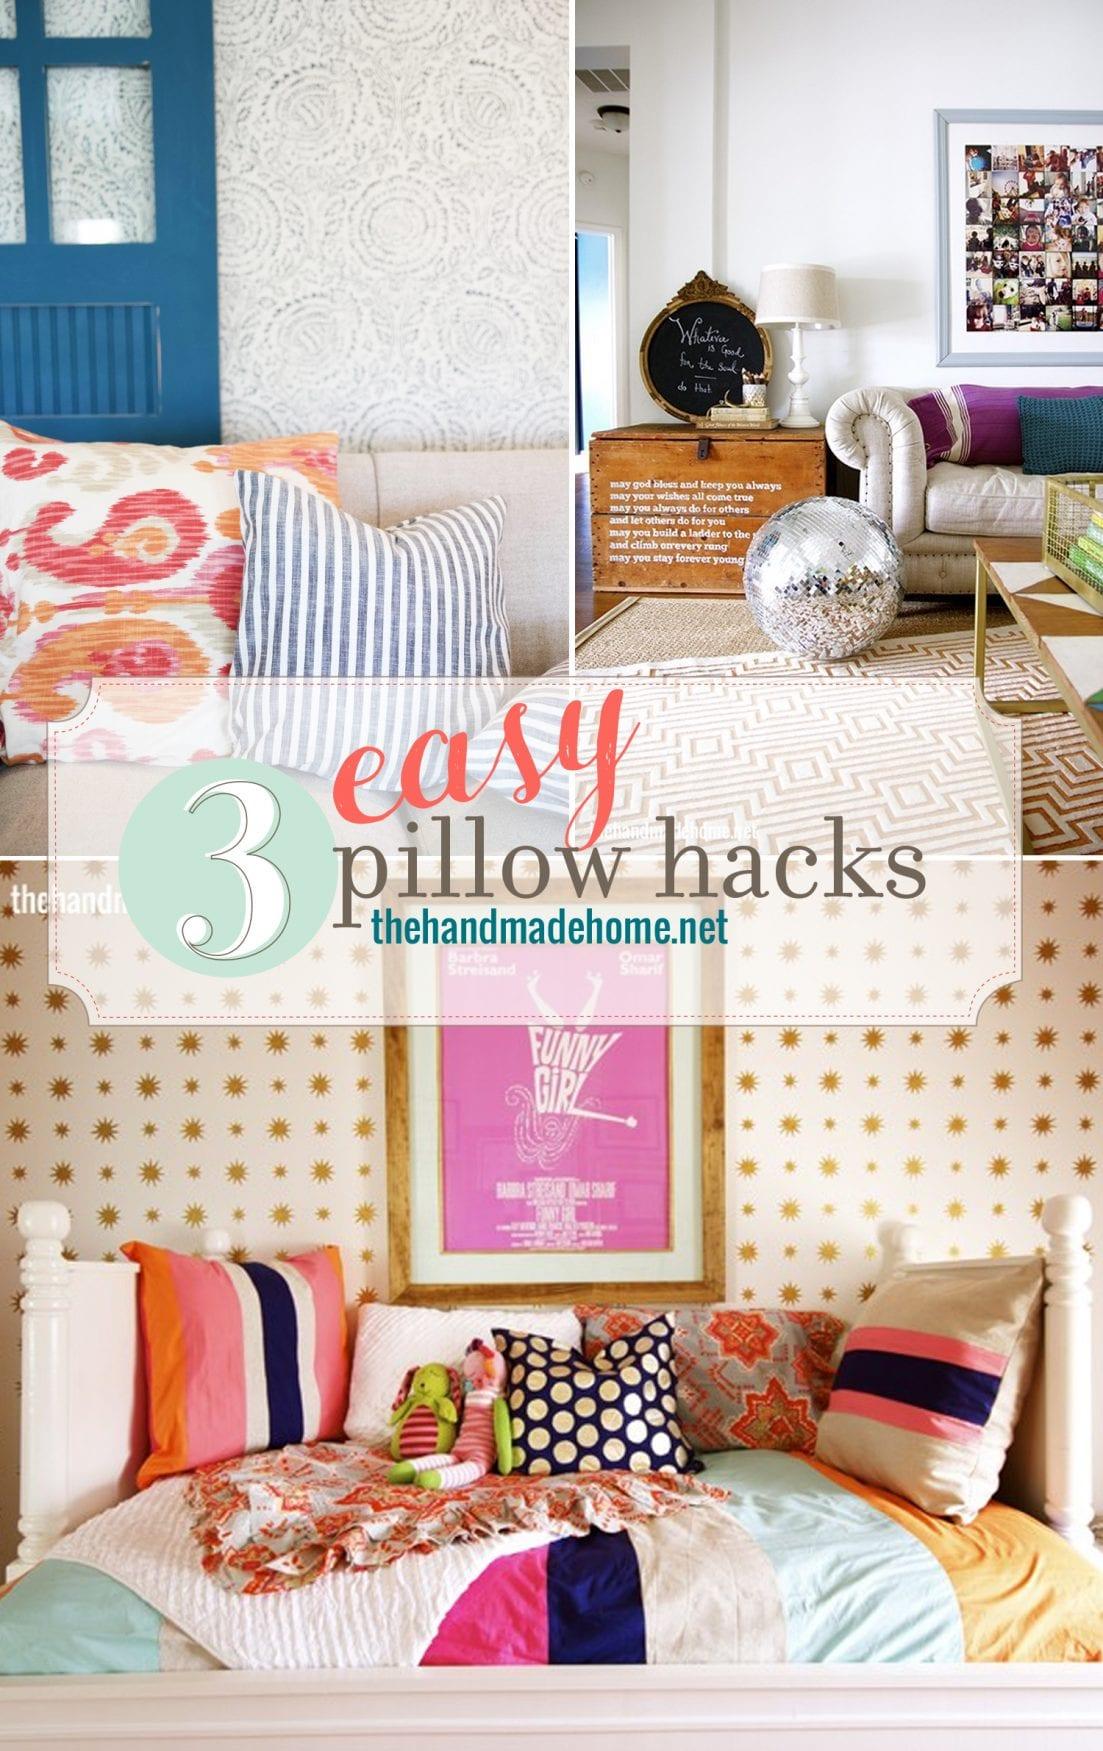 3 easy pillow hacks